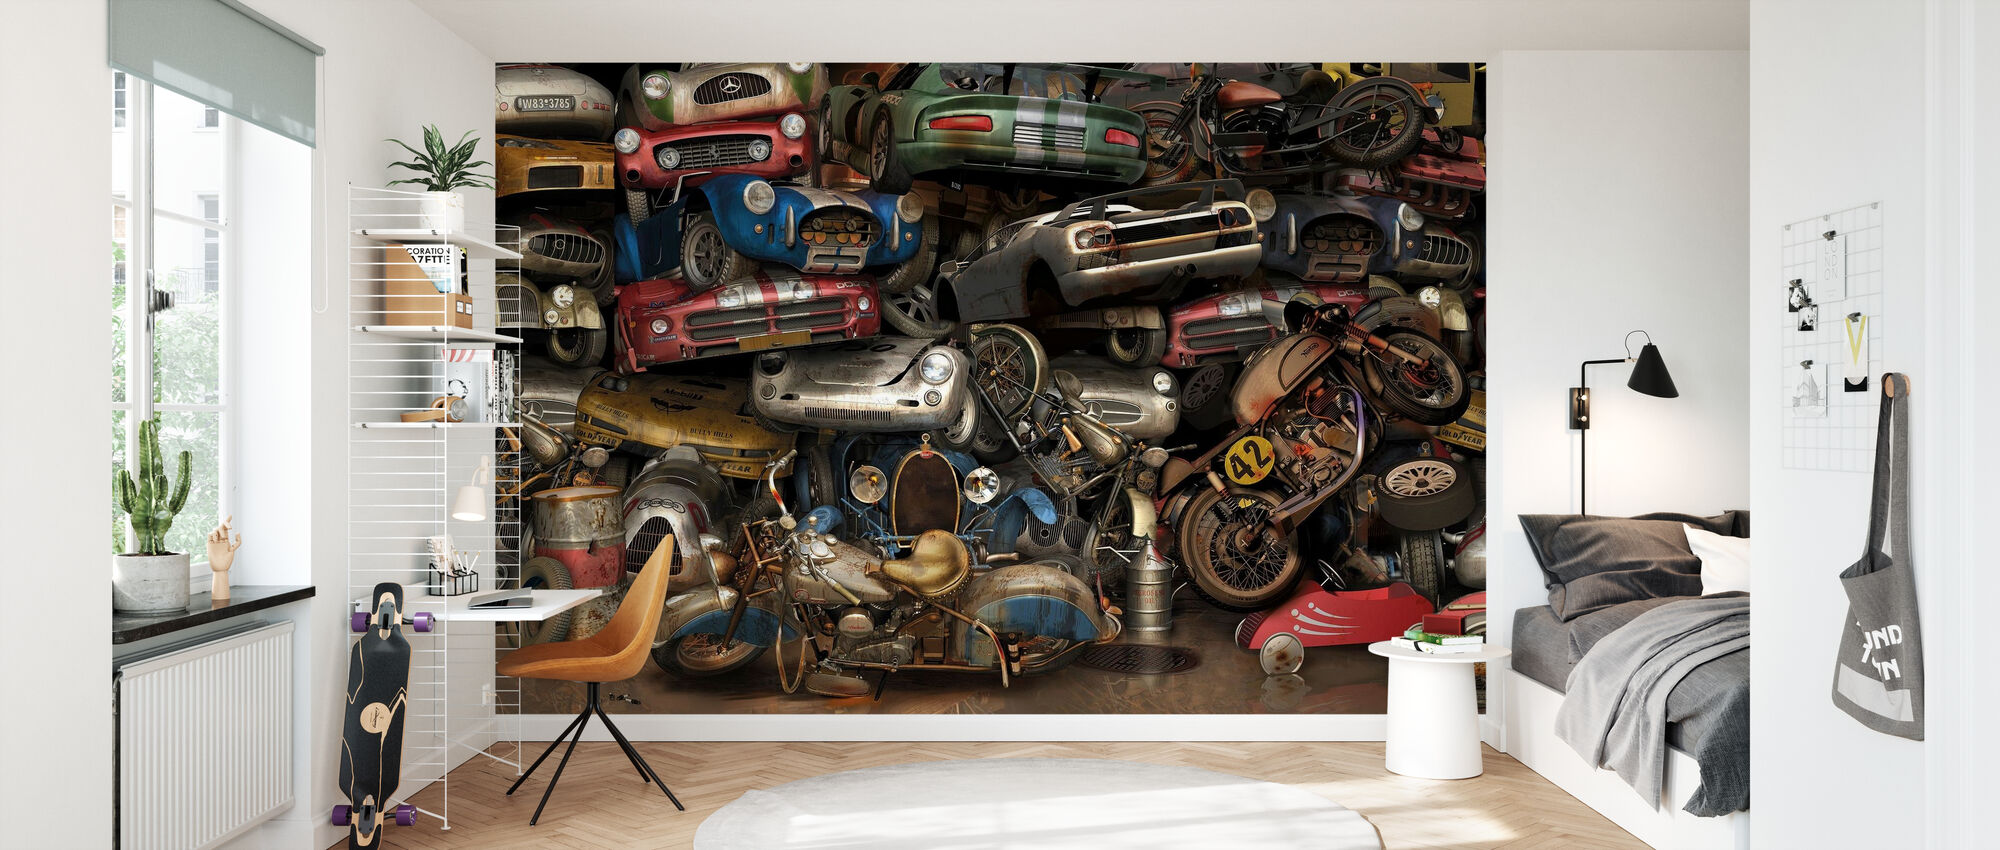 Recycling Wall - Wallpaper - Kids Room